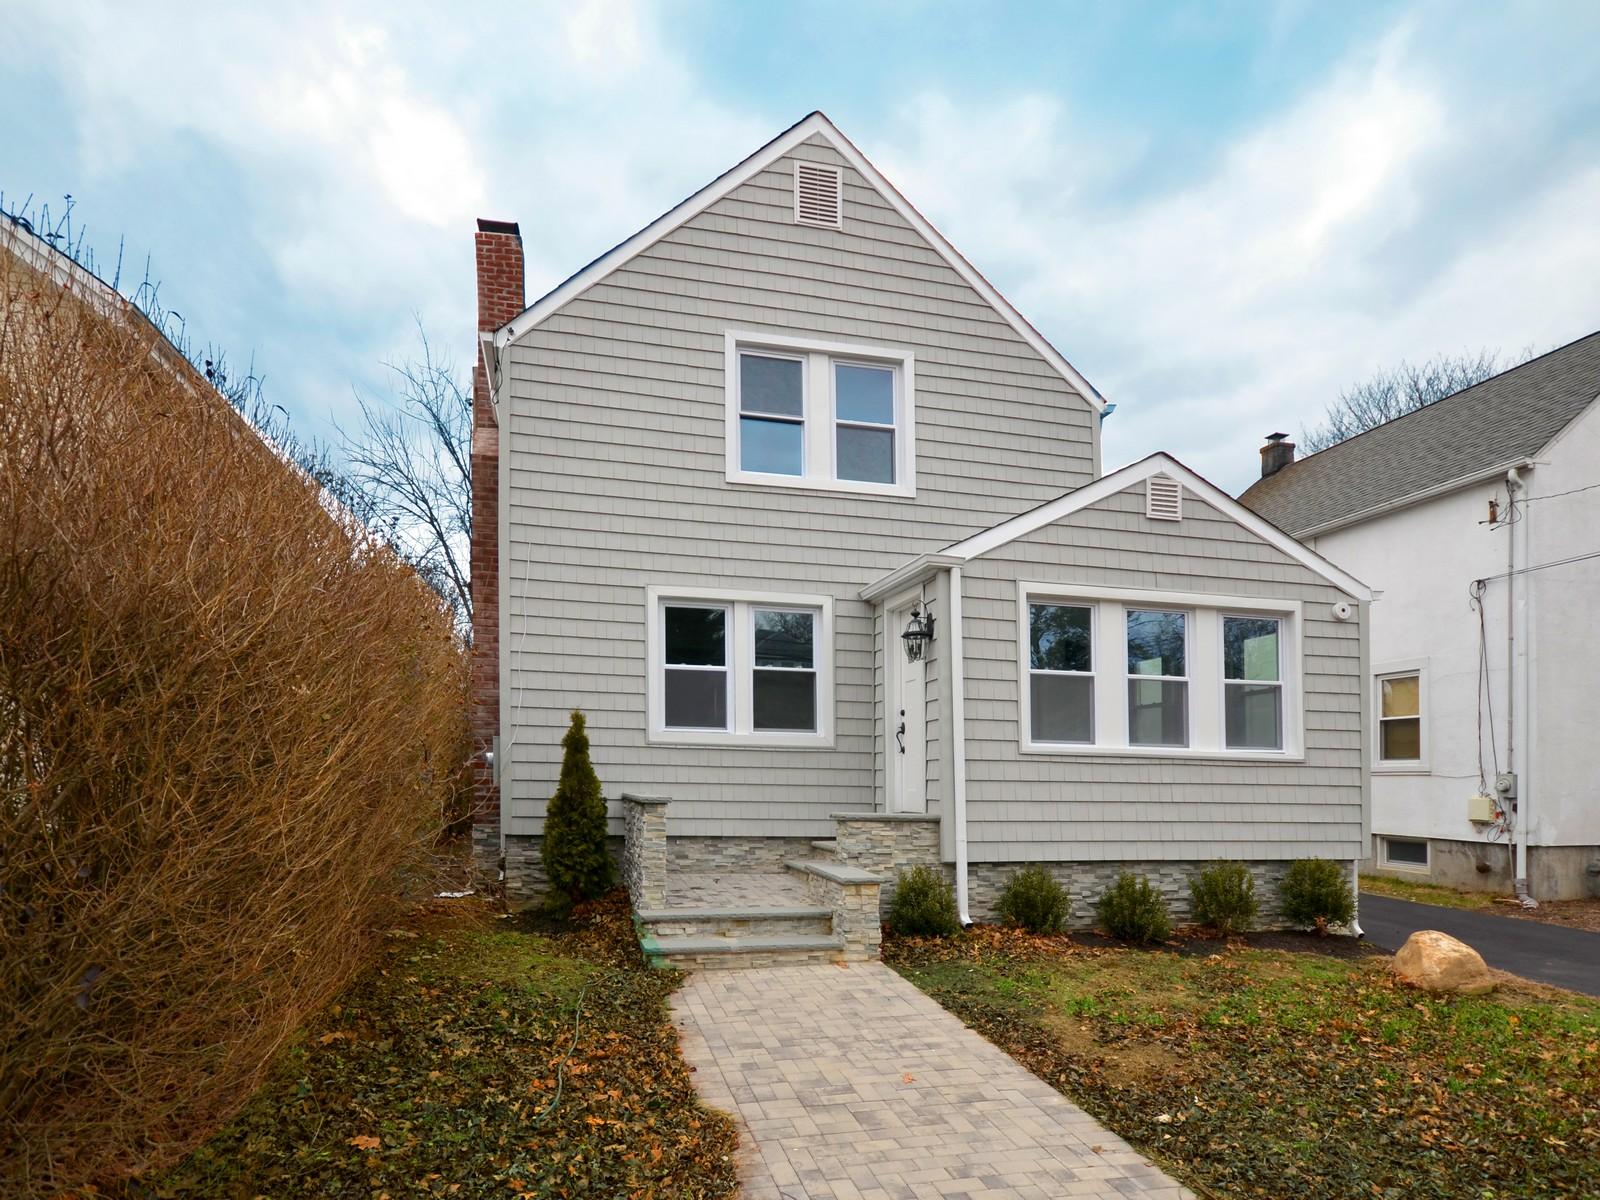 Apartamentos multi-familiares para Venda às Colonial 25 Fairview Ave Port Washington, Nova York, 11050 Estados Unidos